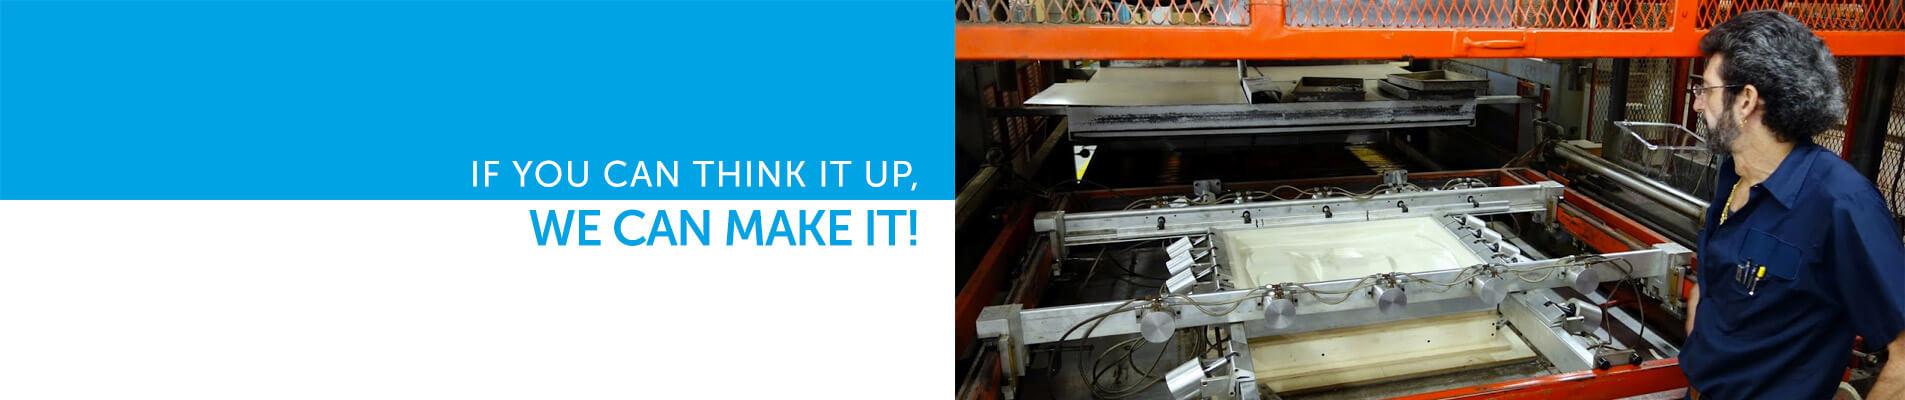 Plastic Product Fabrication Company in Utah